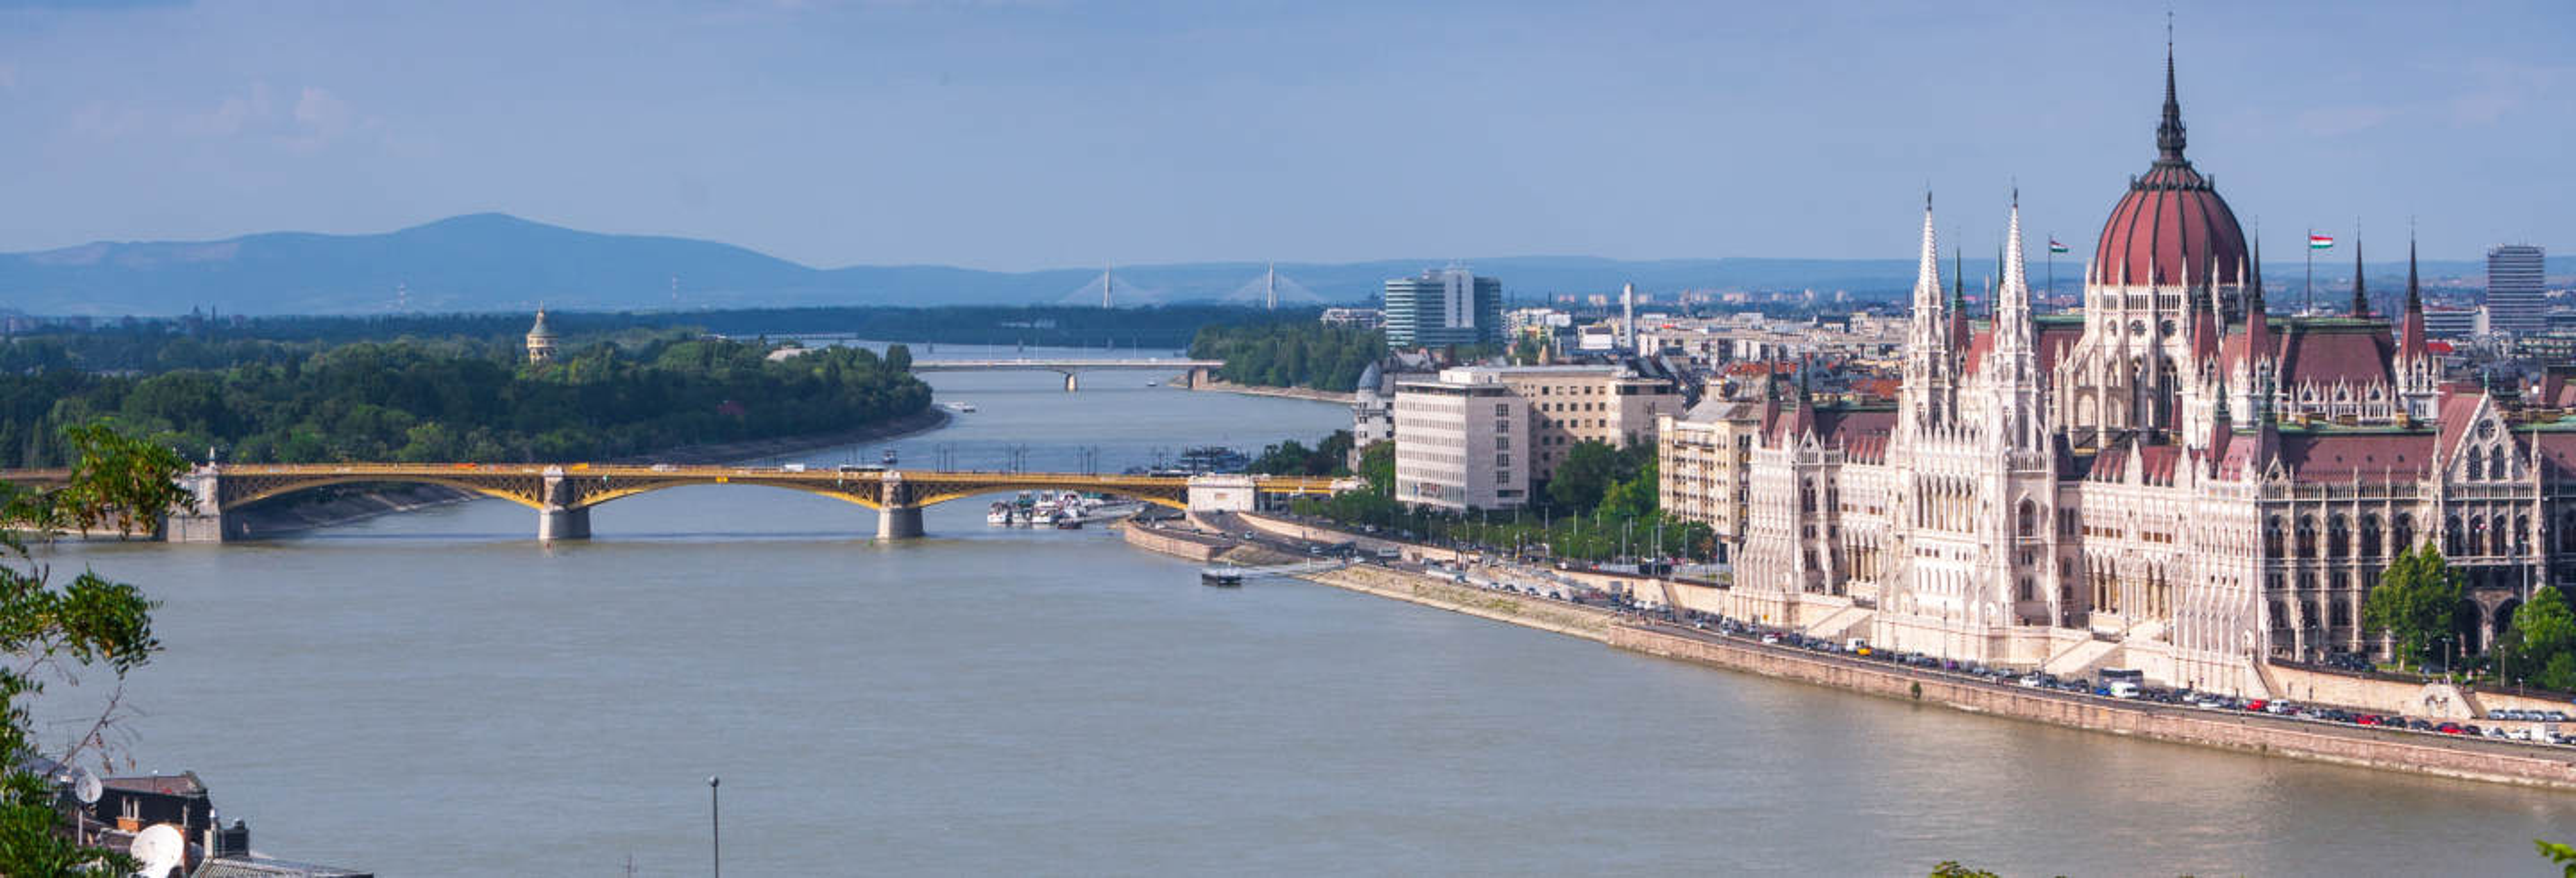 Tour de 4 días por Viena, Budapest y Bratislava